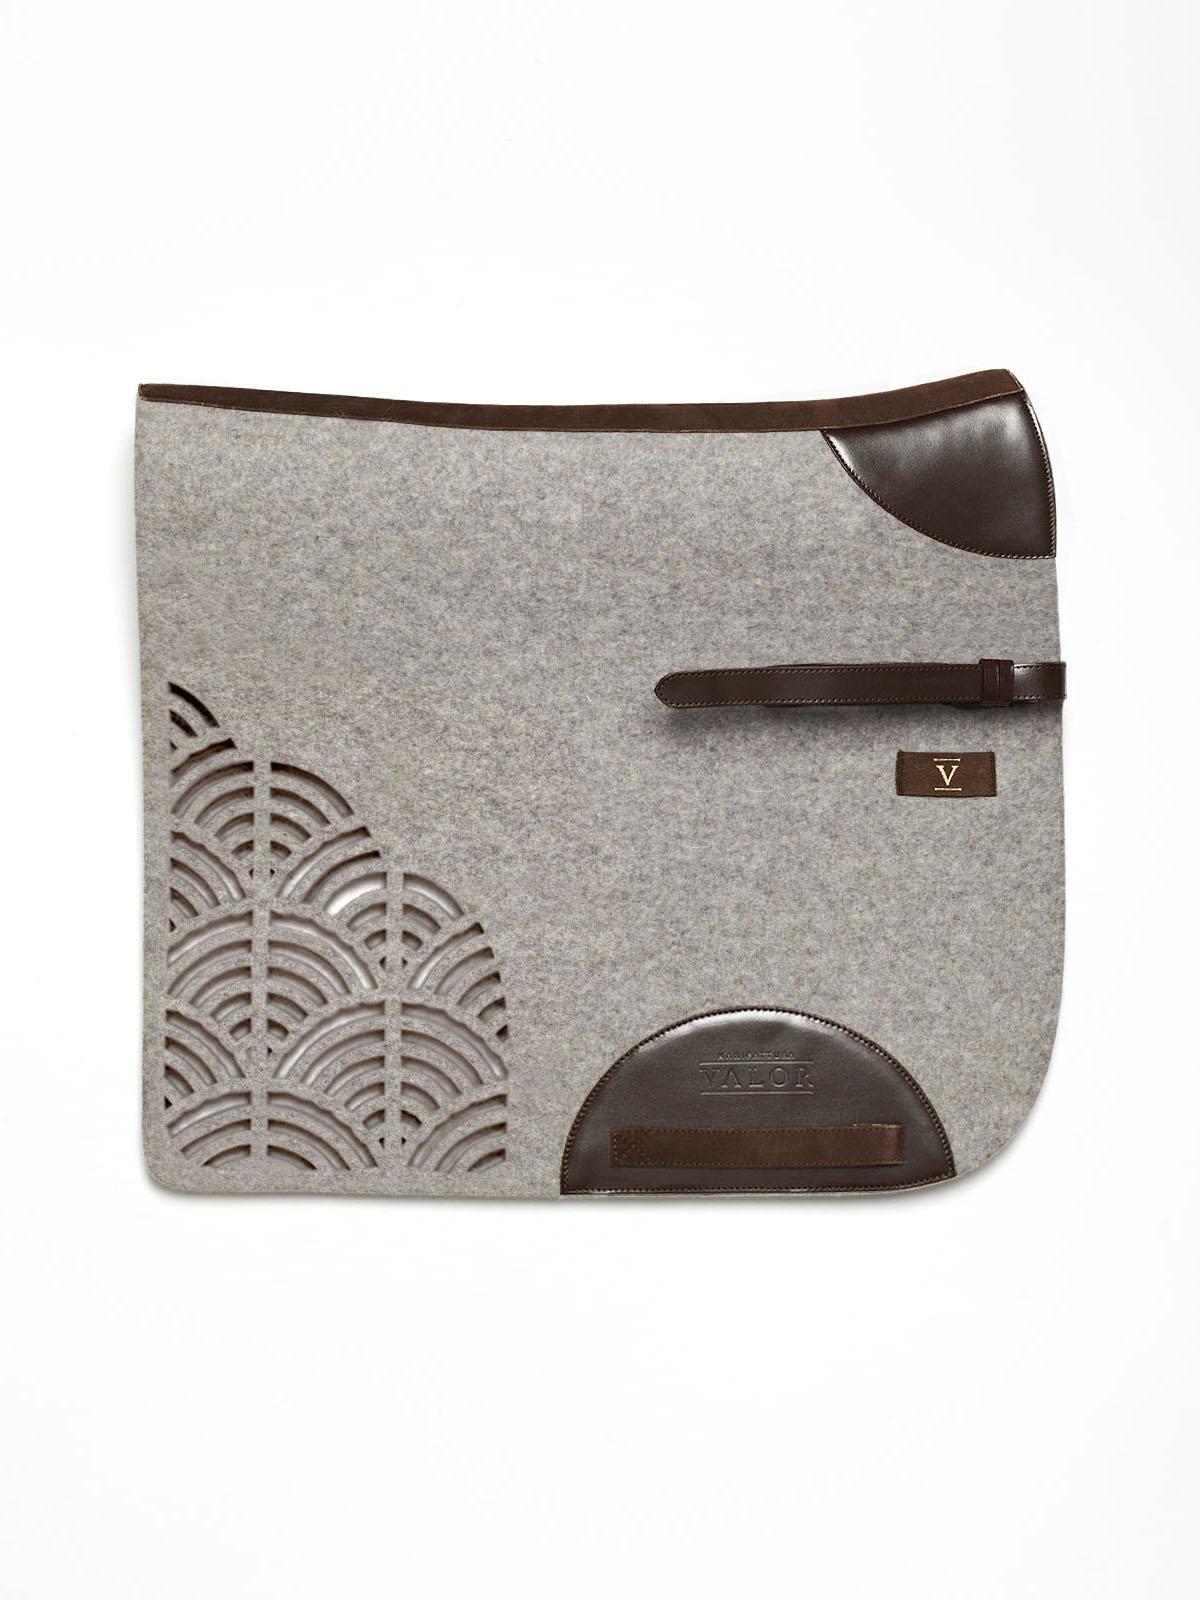 wool saddle pads